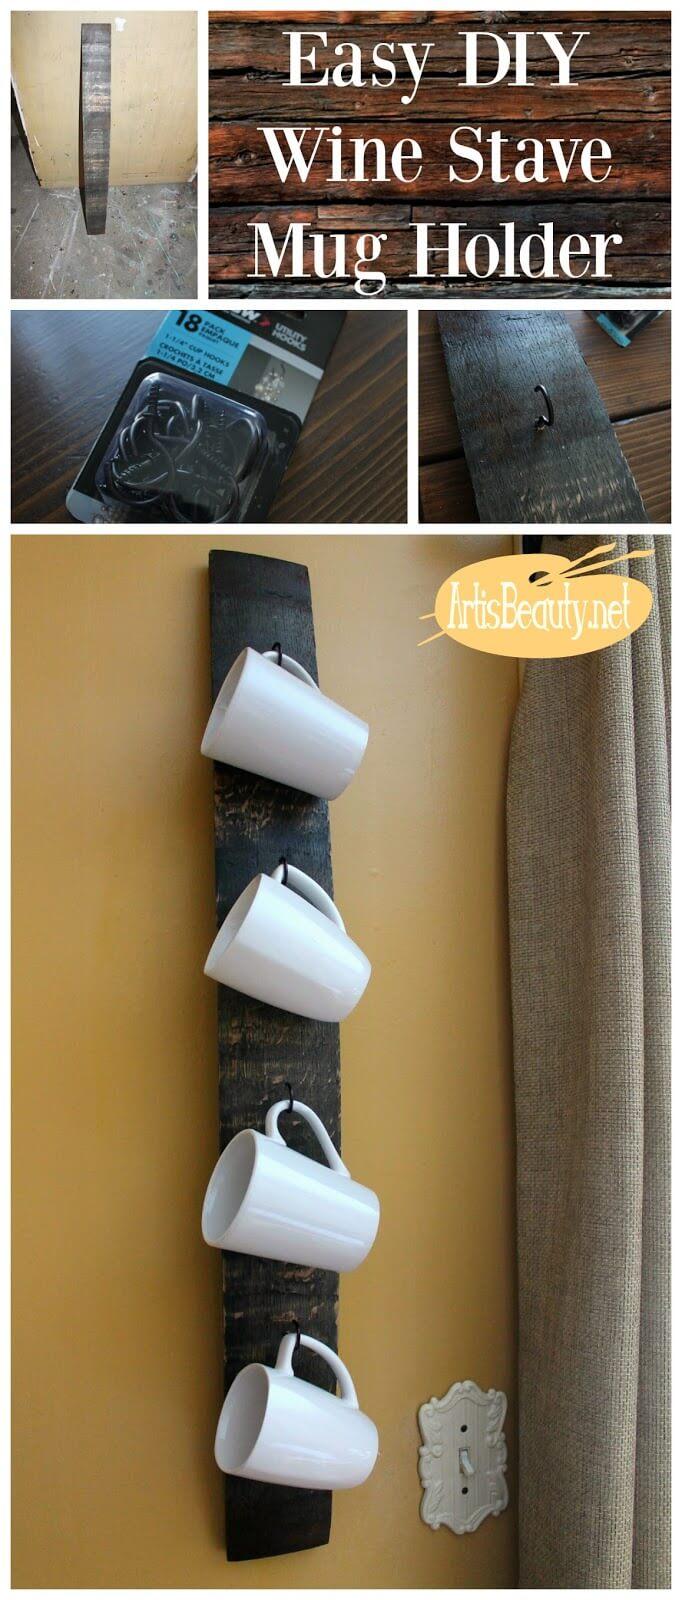 DIY Coffee Mug Holders with Wine Barrel Staves